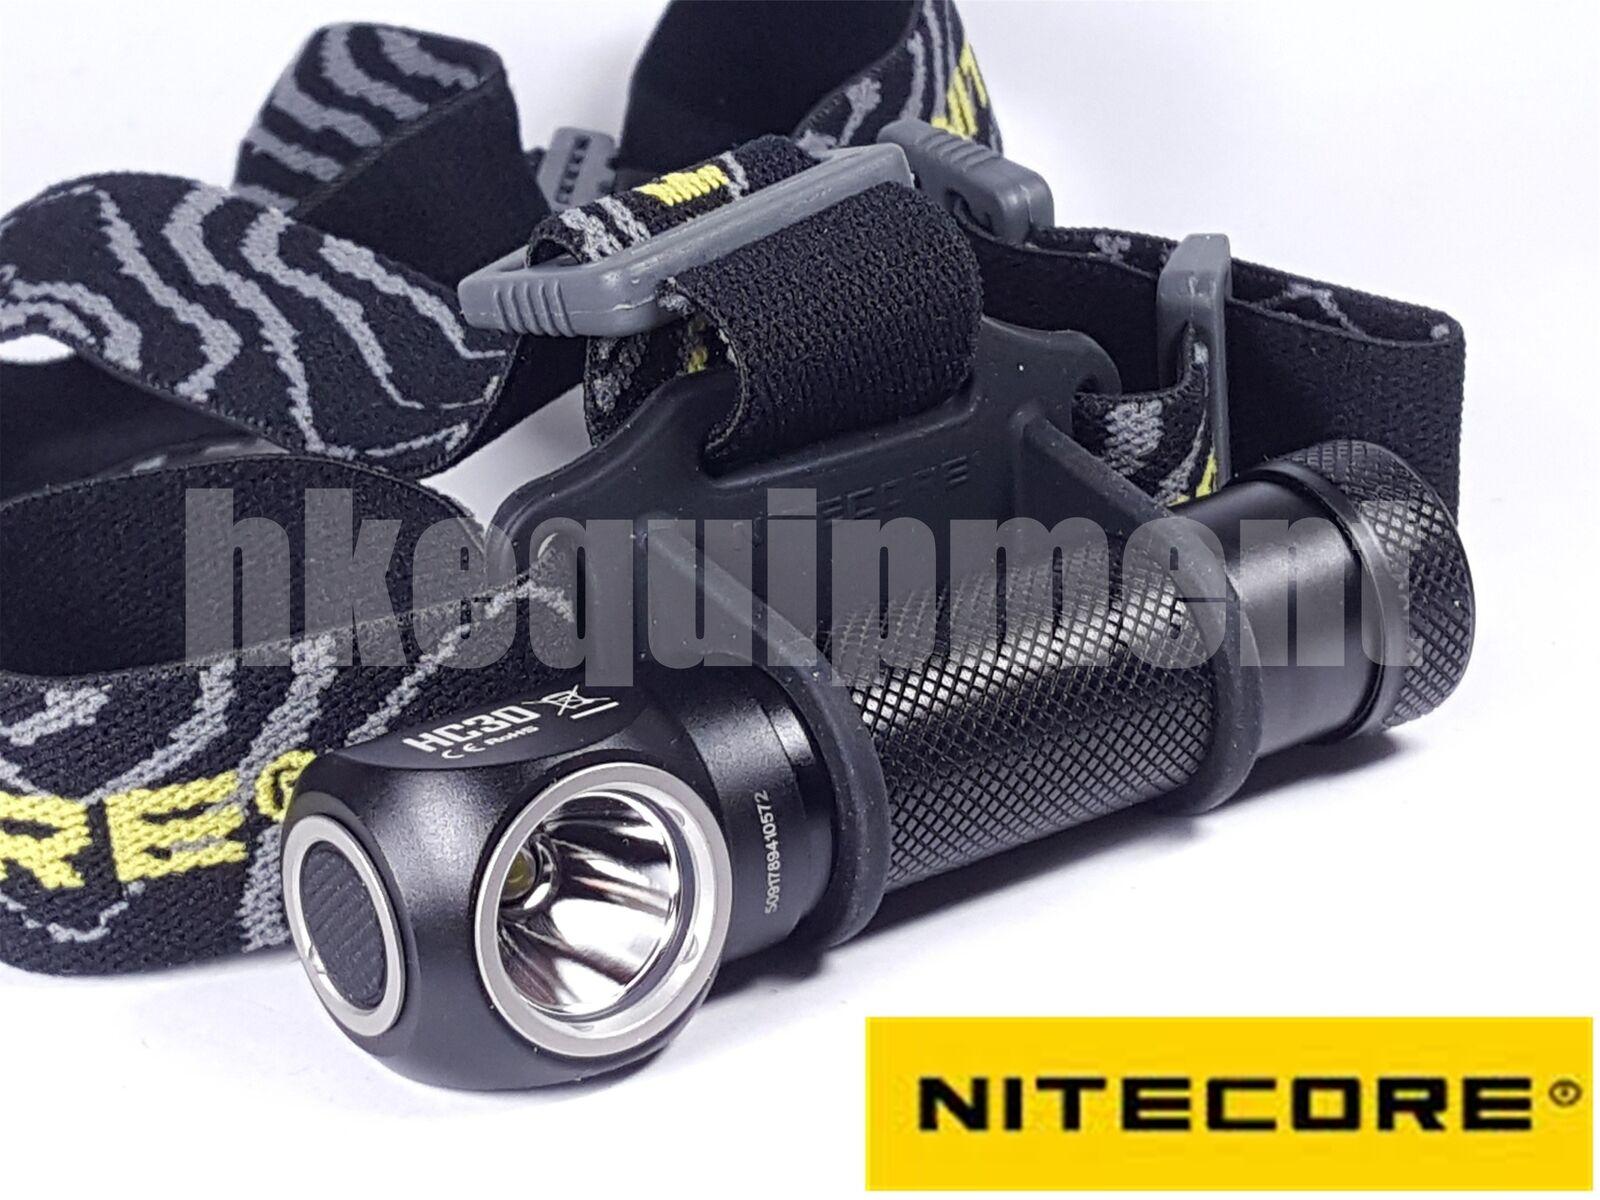 NiteCore HC30 HC30W Cree XM-L2 1000lm 18650 Headlight Headlamp +  FREE 2x CR123A  fashion mall